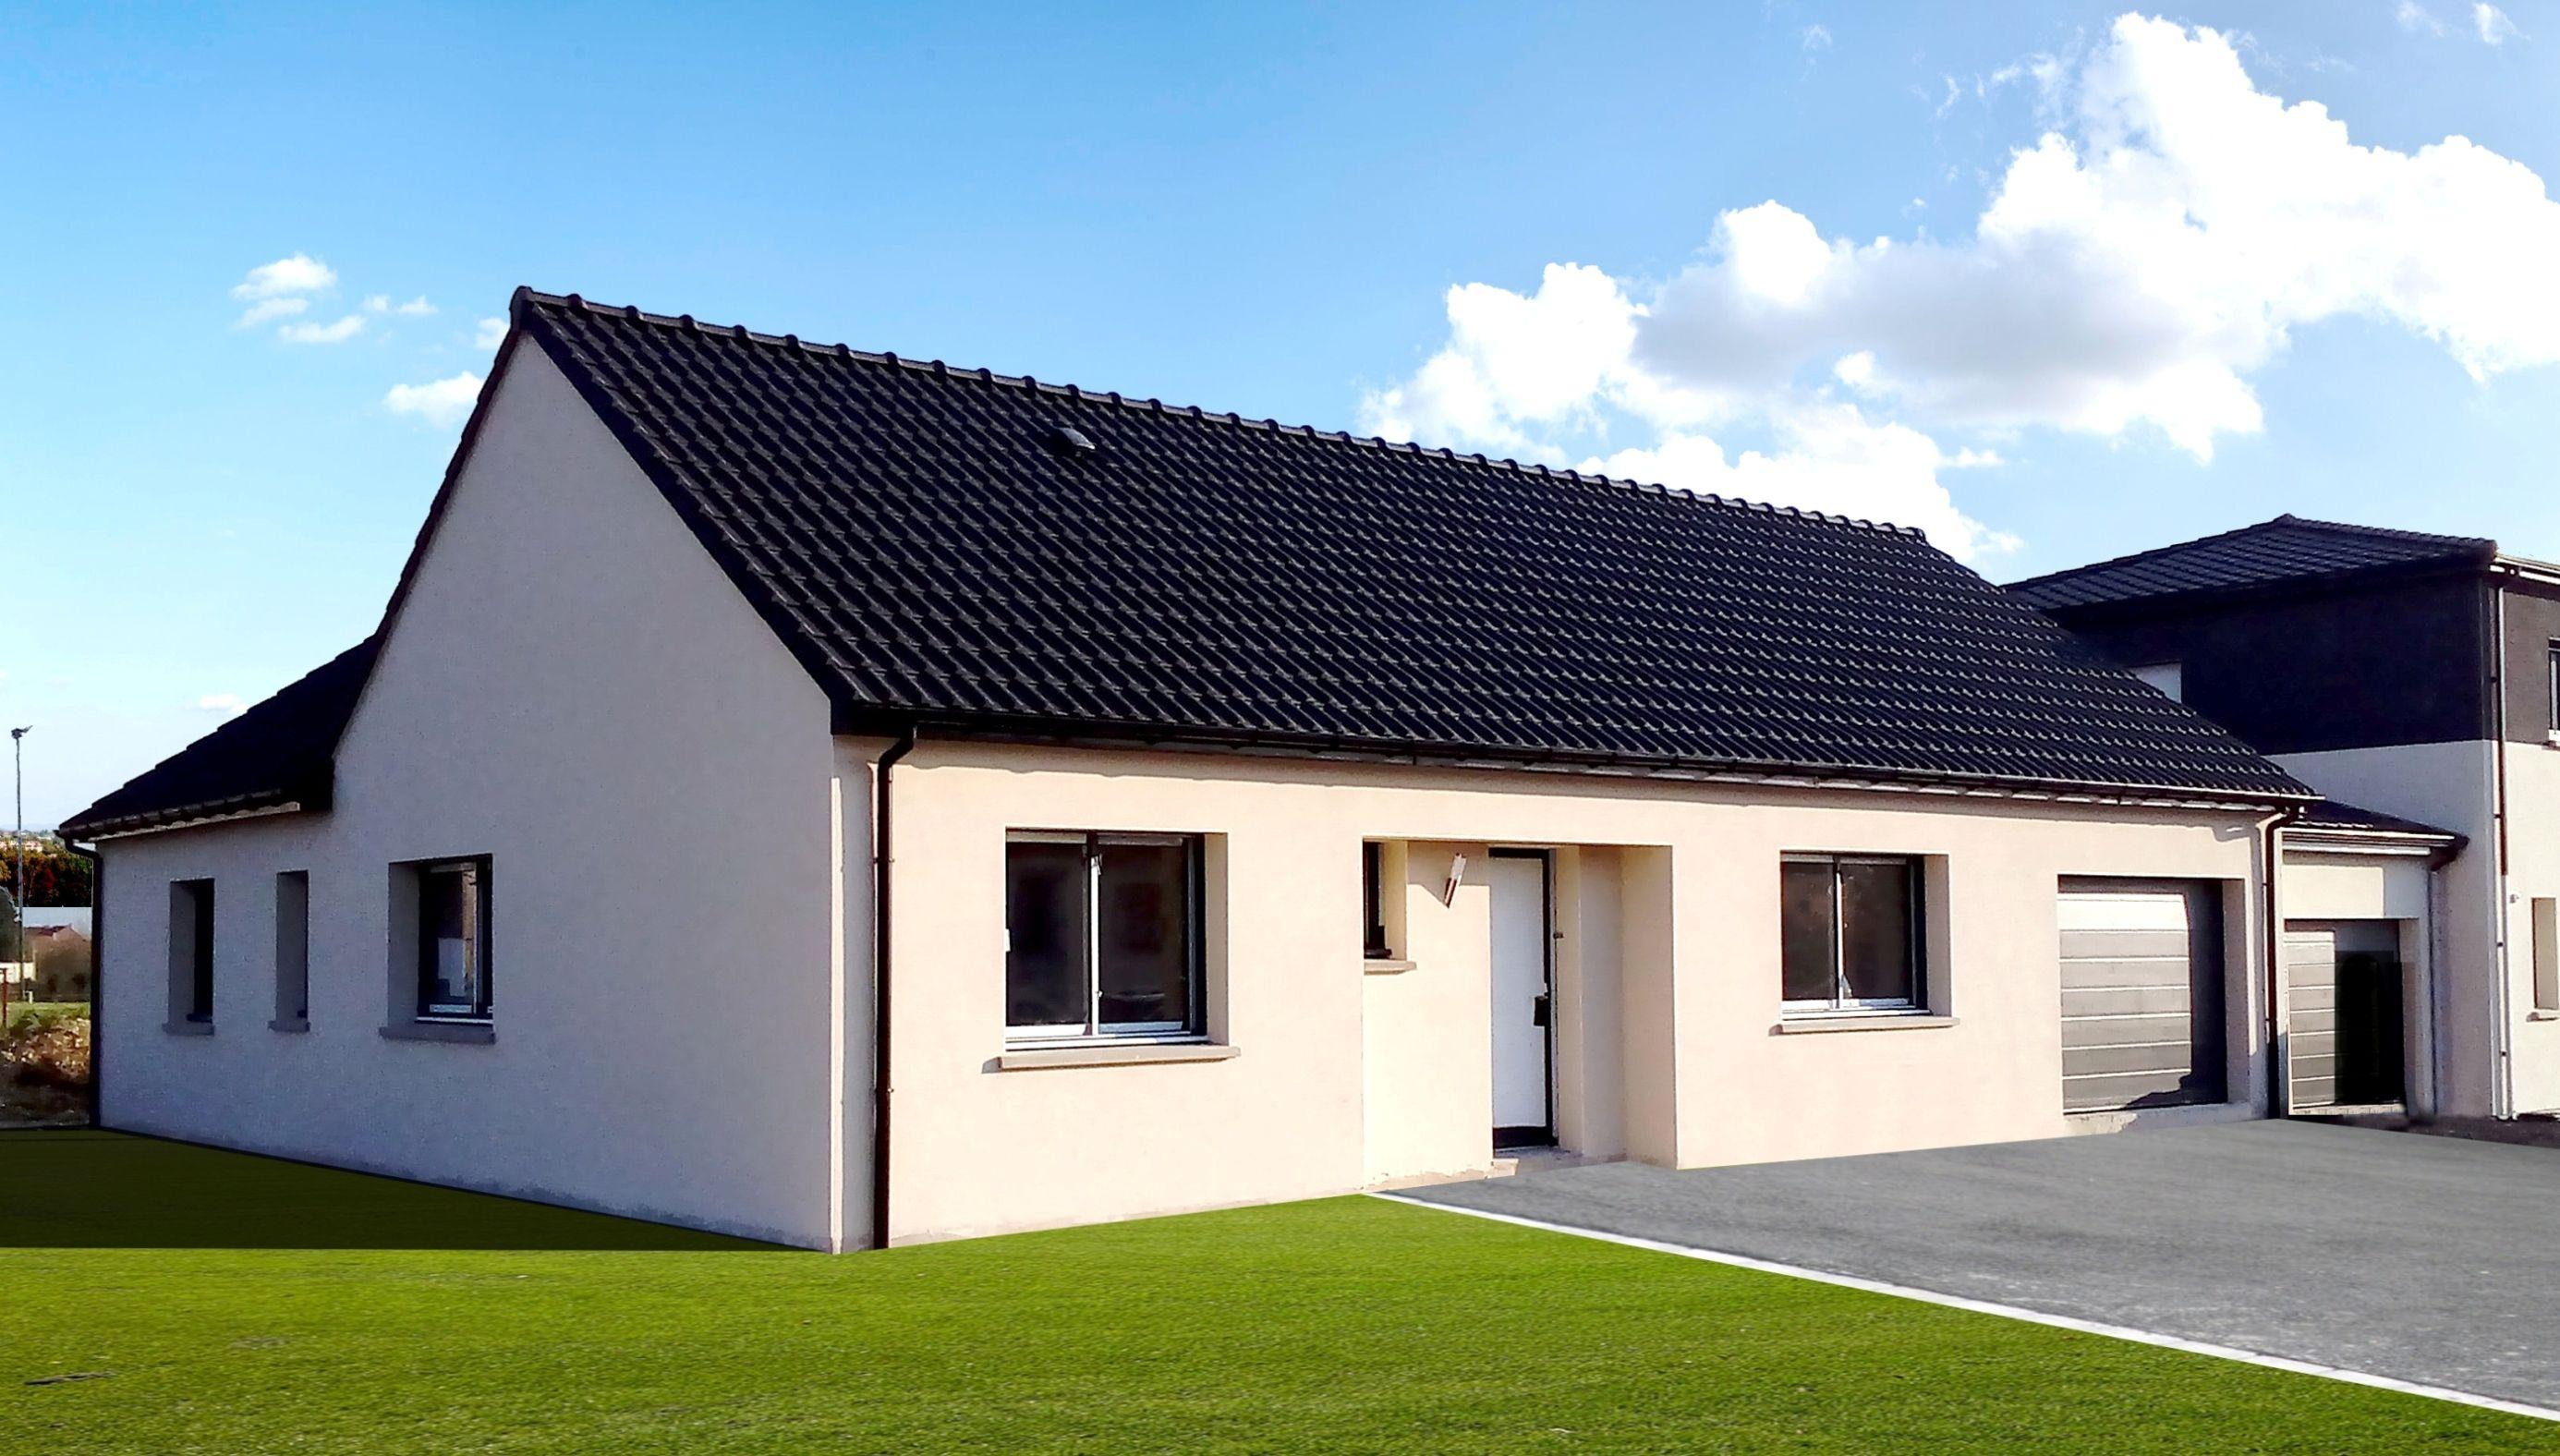 Maisons + Terrains du constructeur CASTOR MESNIL ESNARD • 130 m² • SAHURS